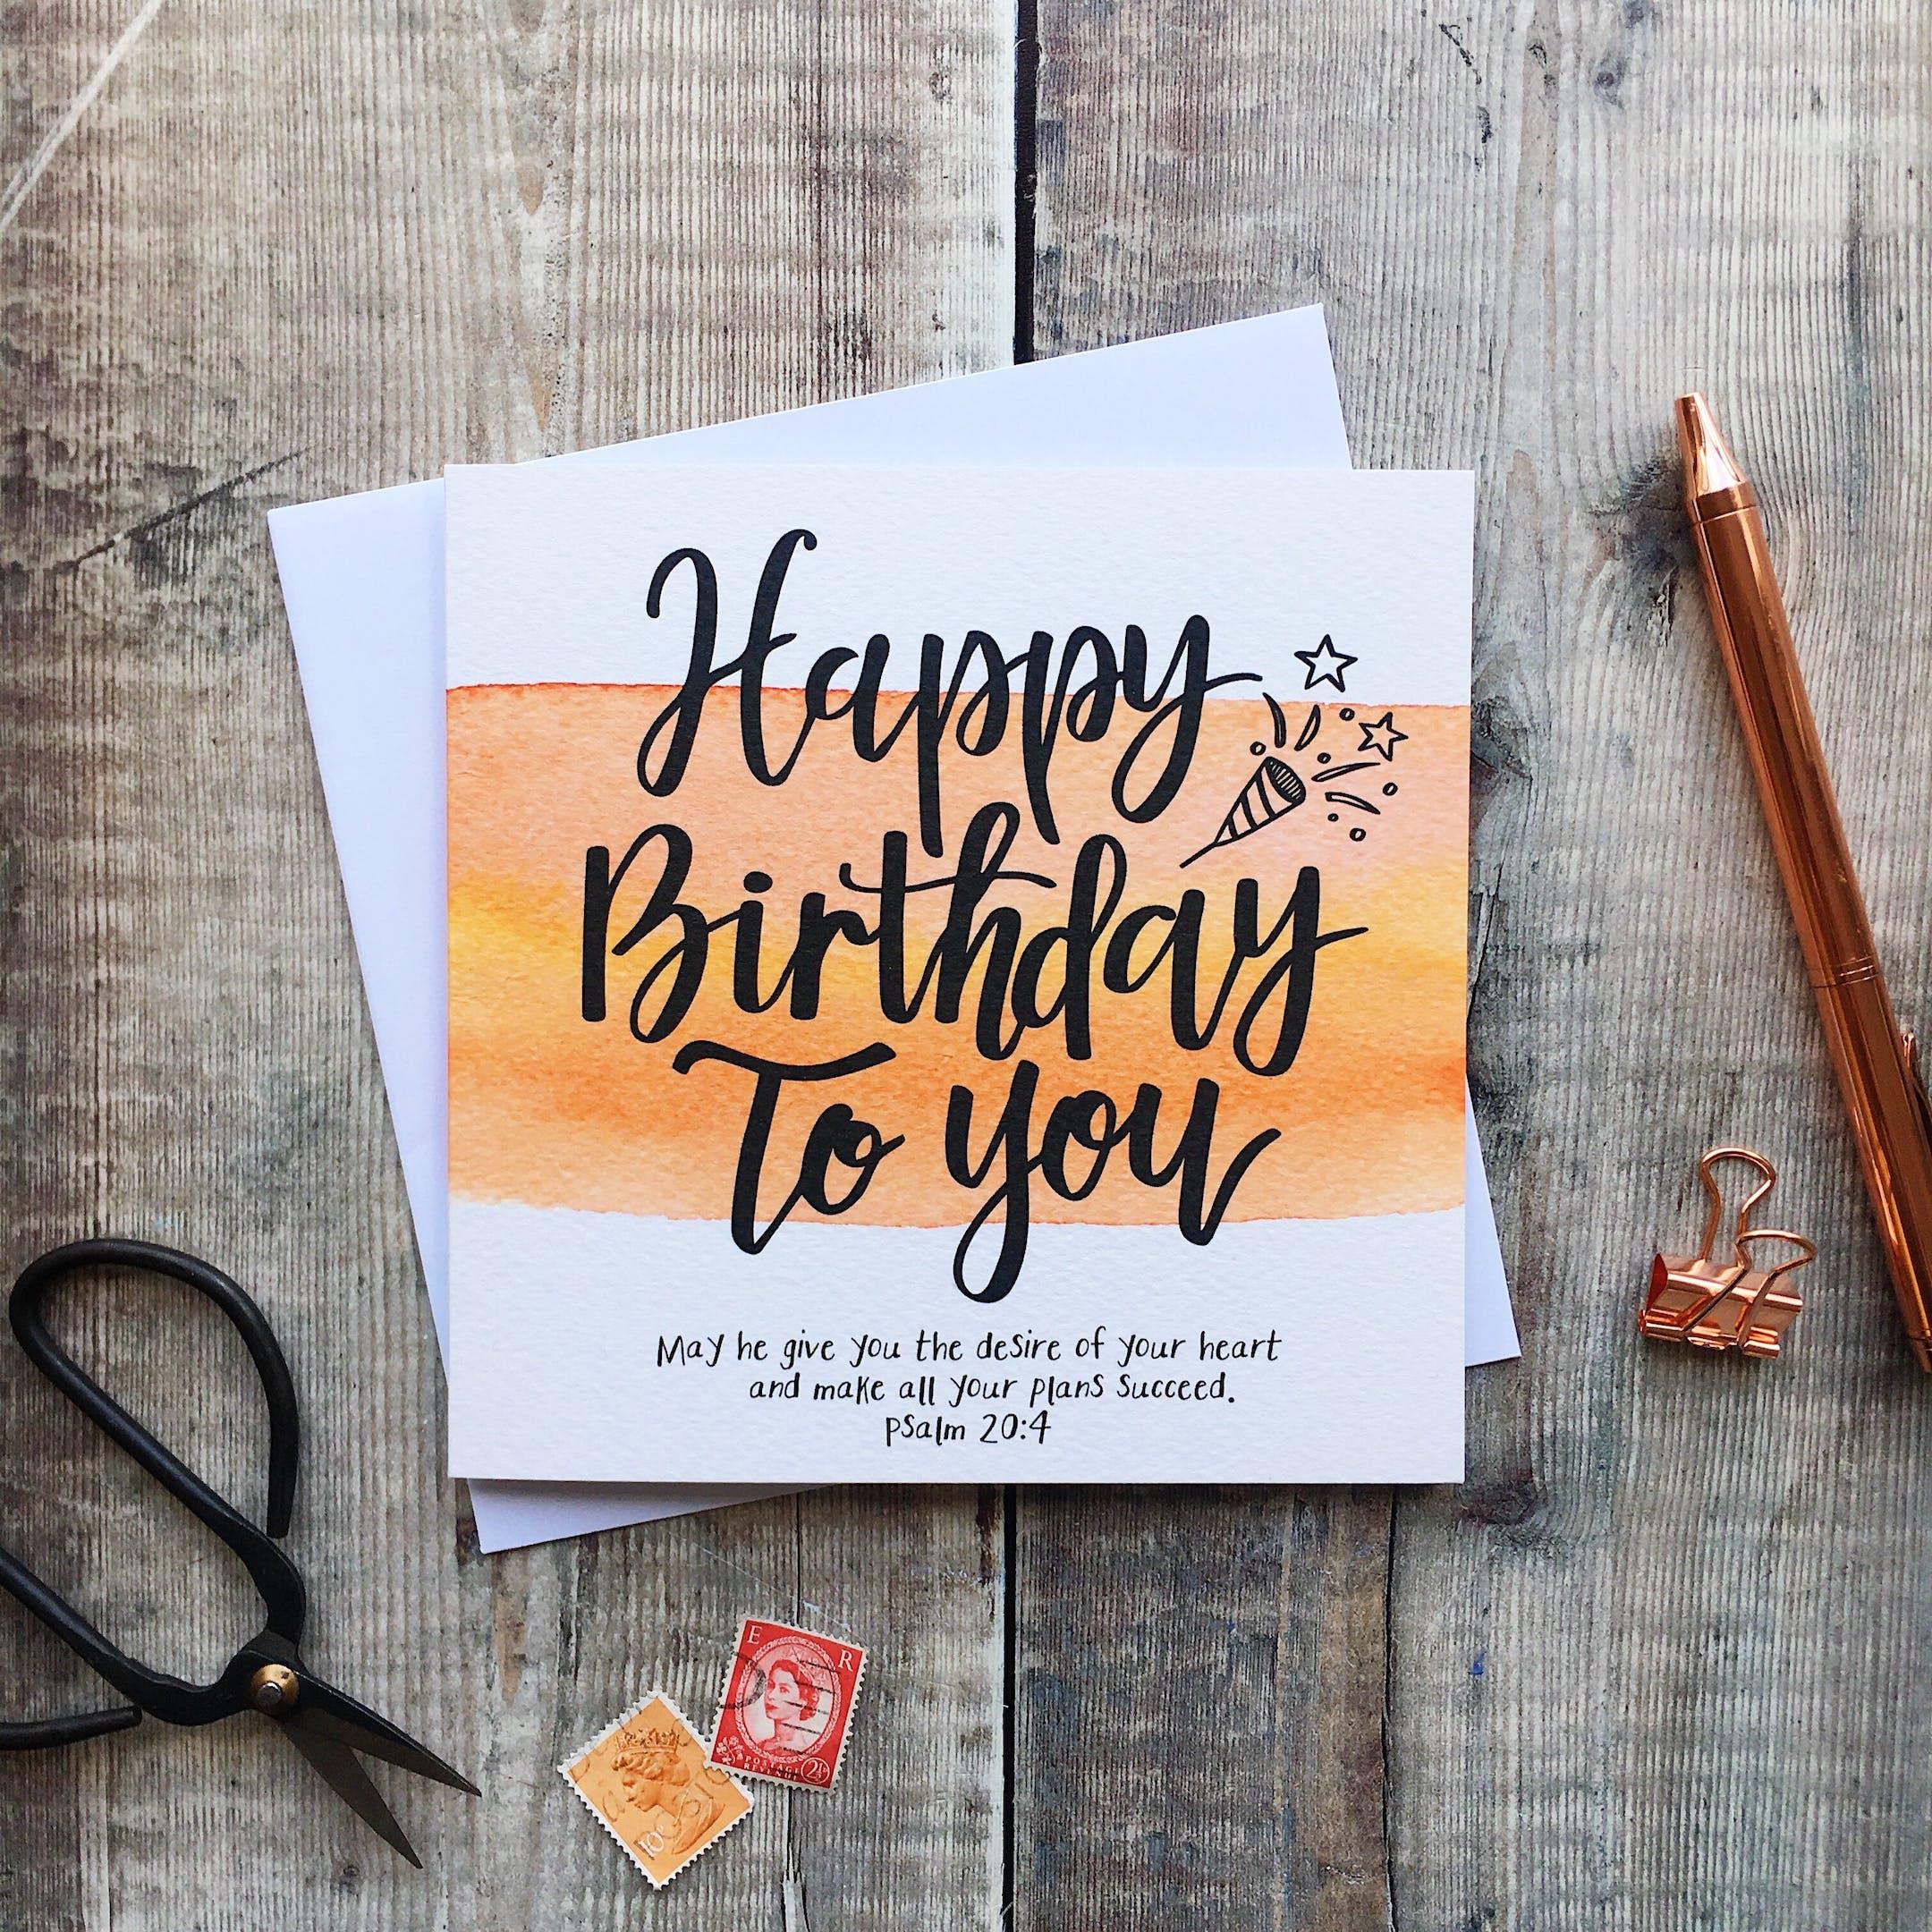 Happy Birthday To You Card - Psalm 20:4 - Izzy and Pop